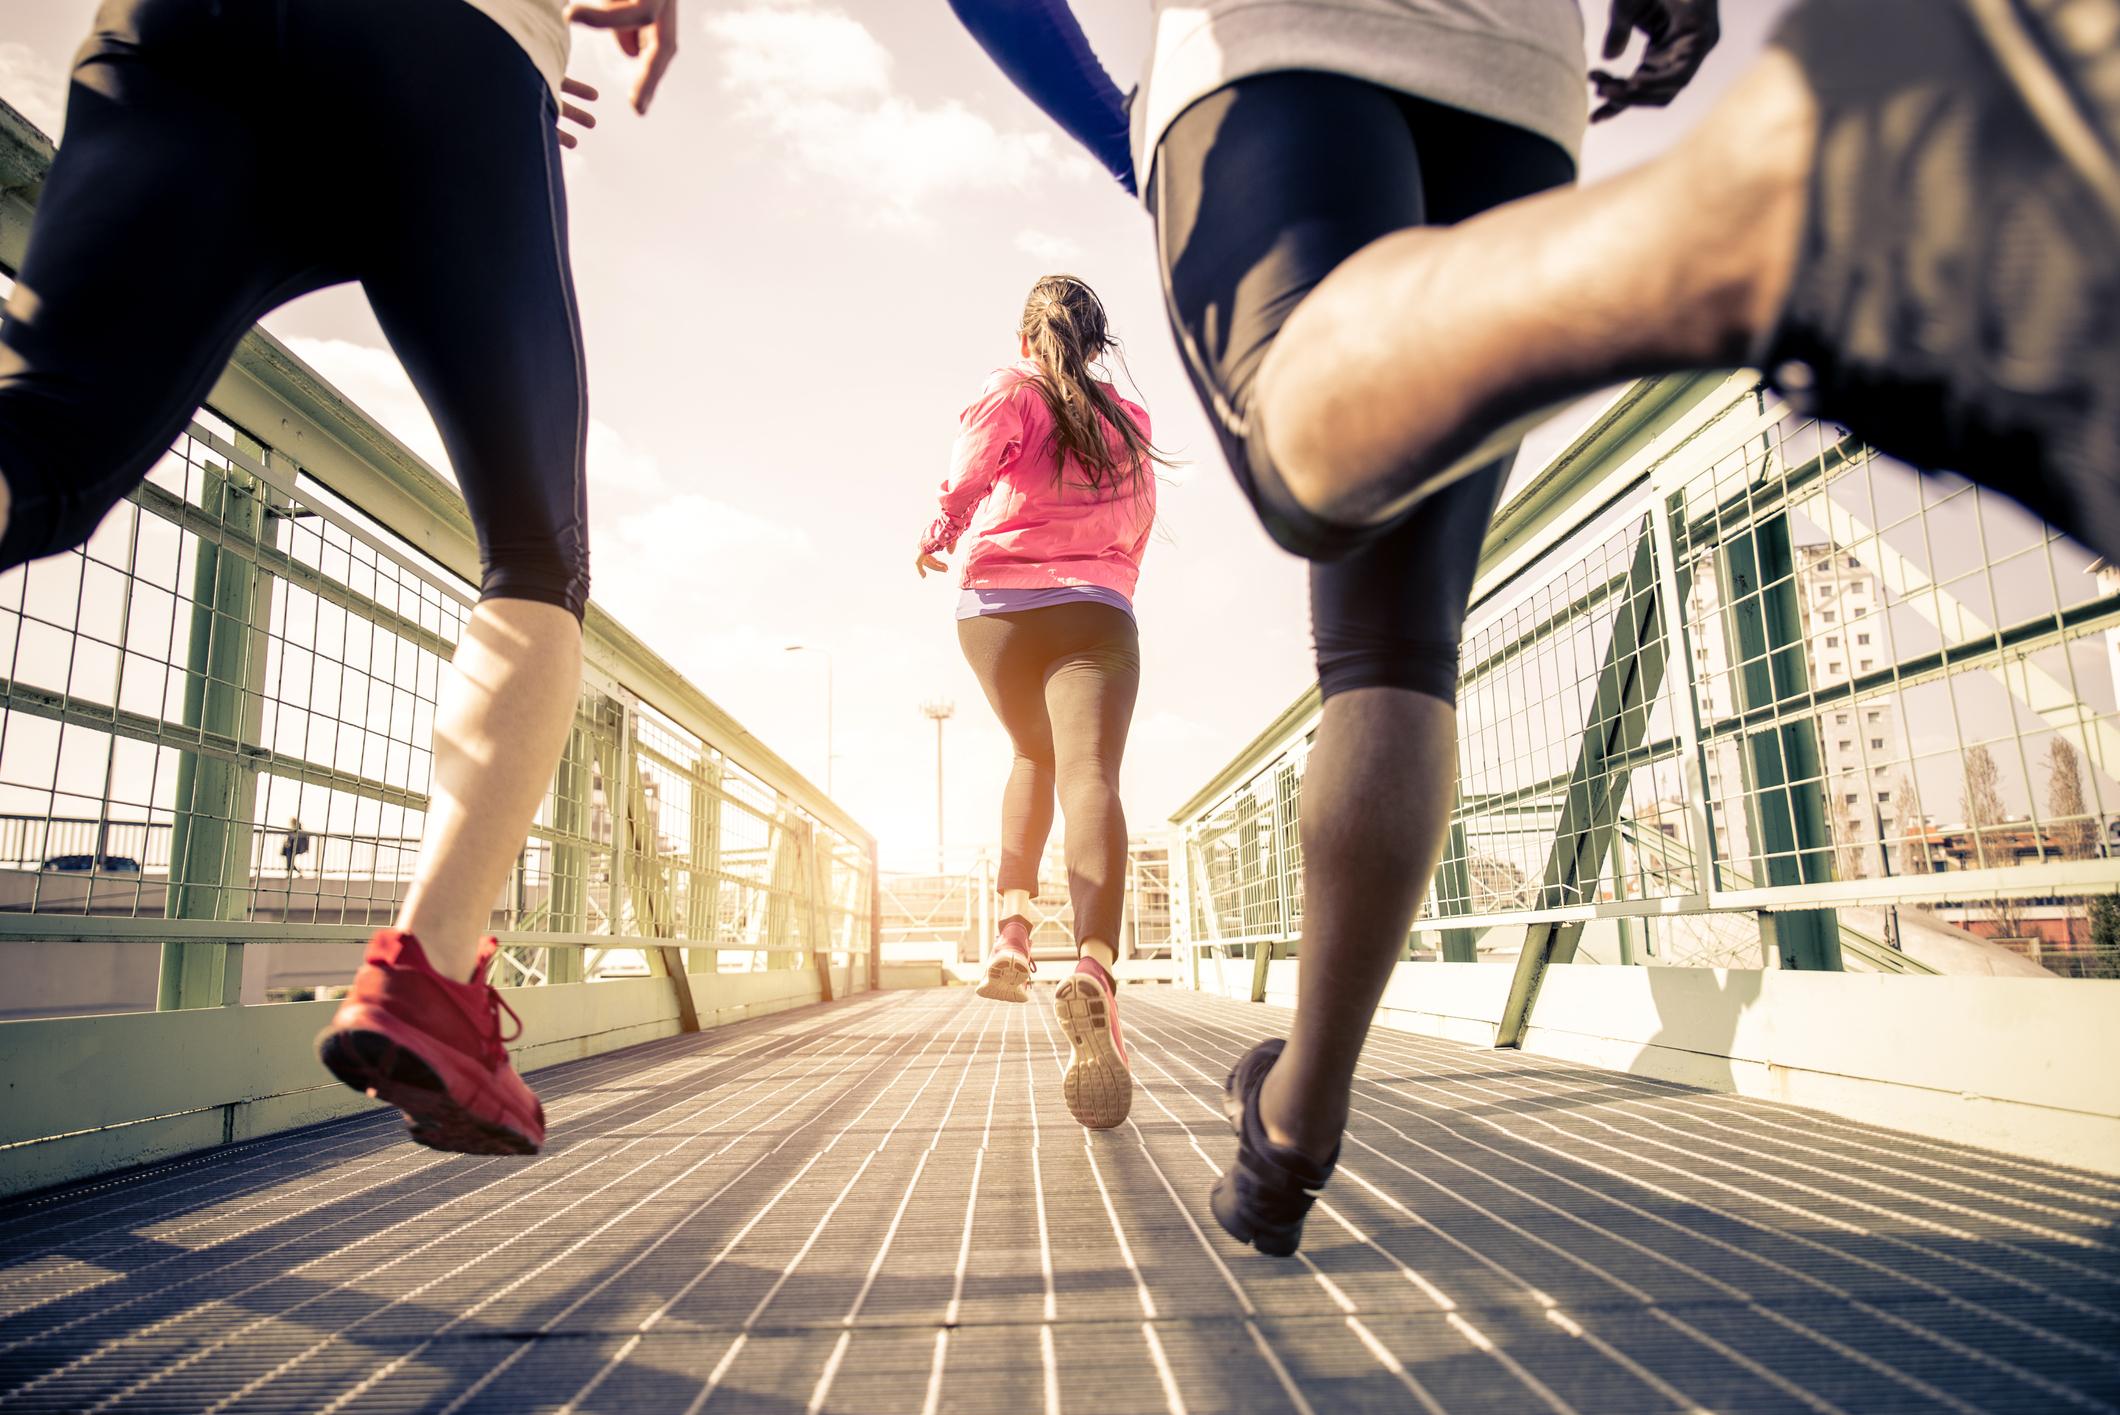 Three people jogging across a foot bridge.